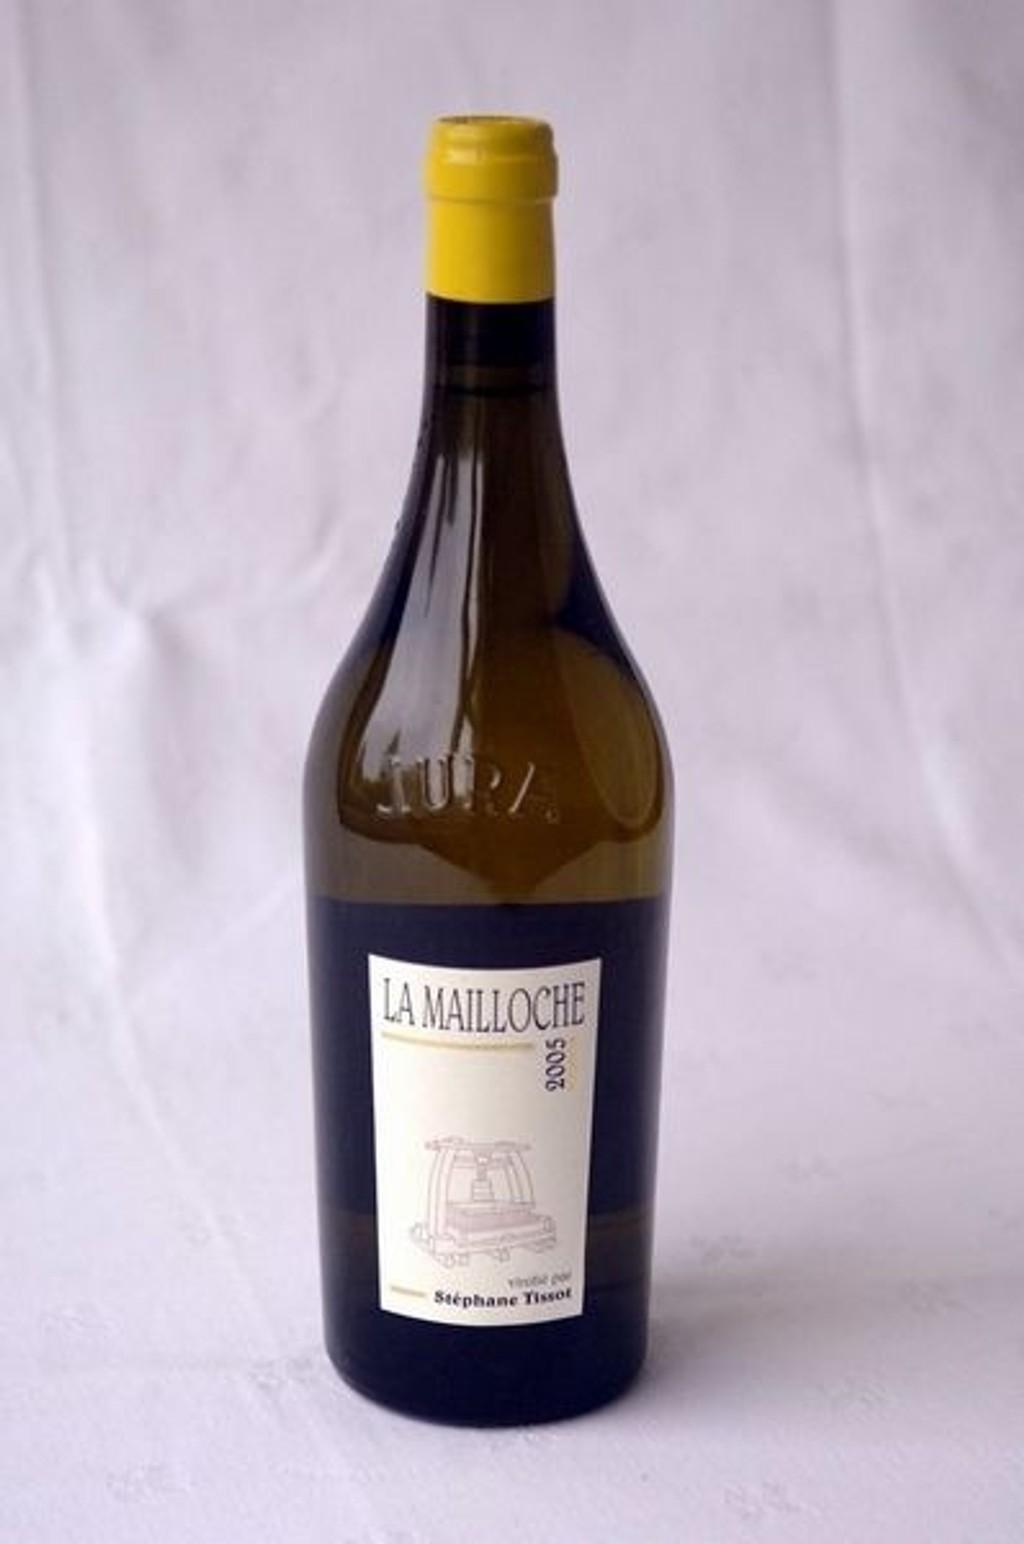 TIL HØNS: Chardonnay la Mailloche 2005.